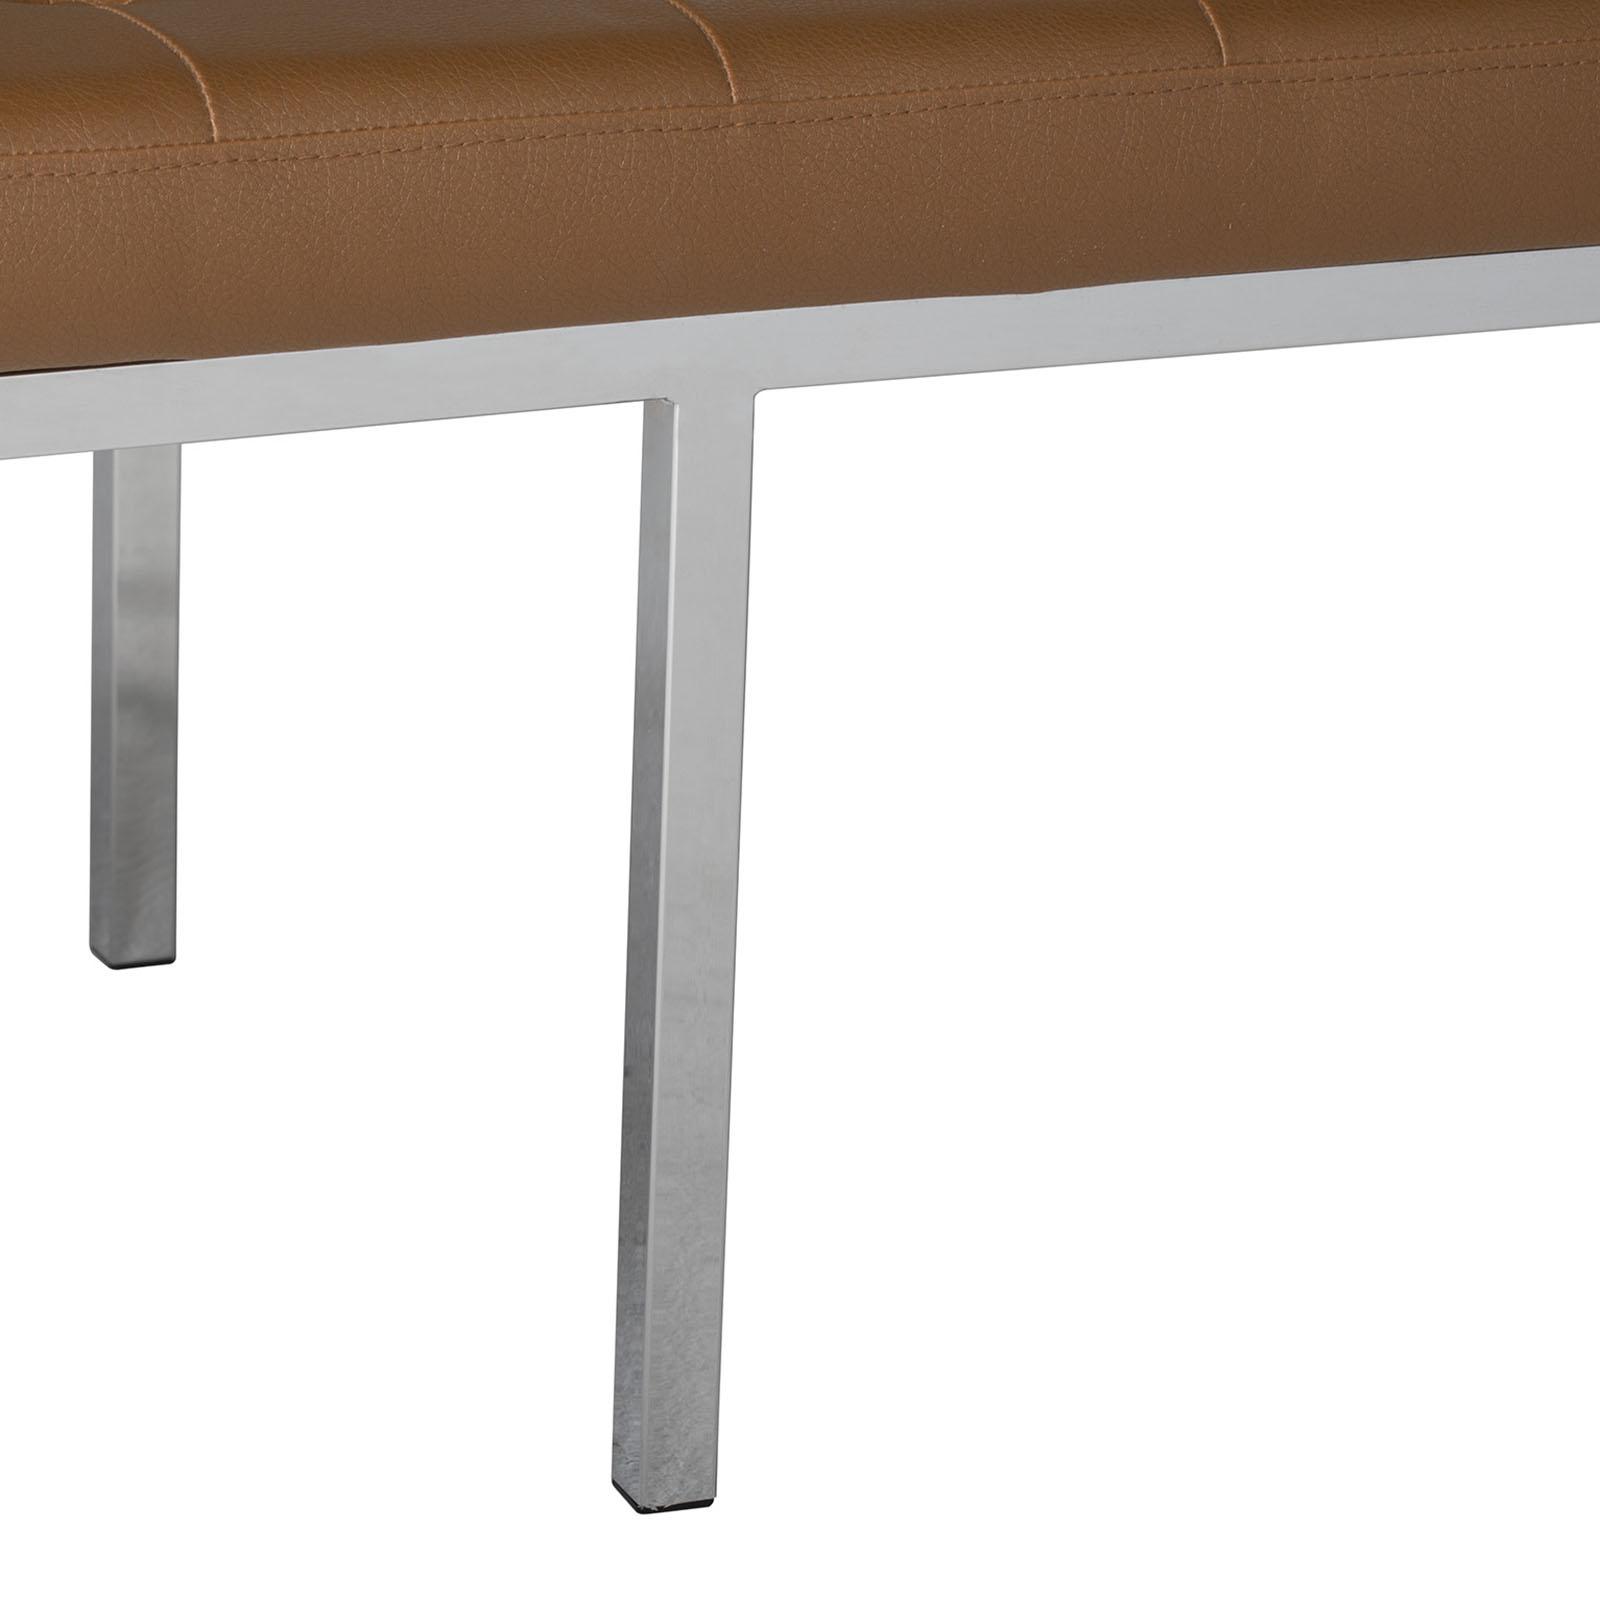 72040 Lintel 60 Inch Bench detail1